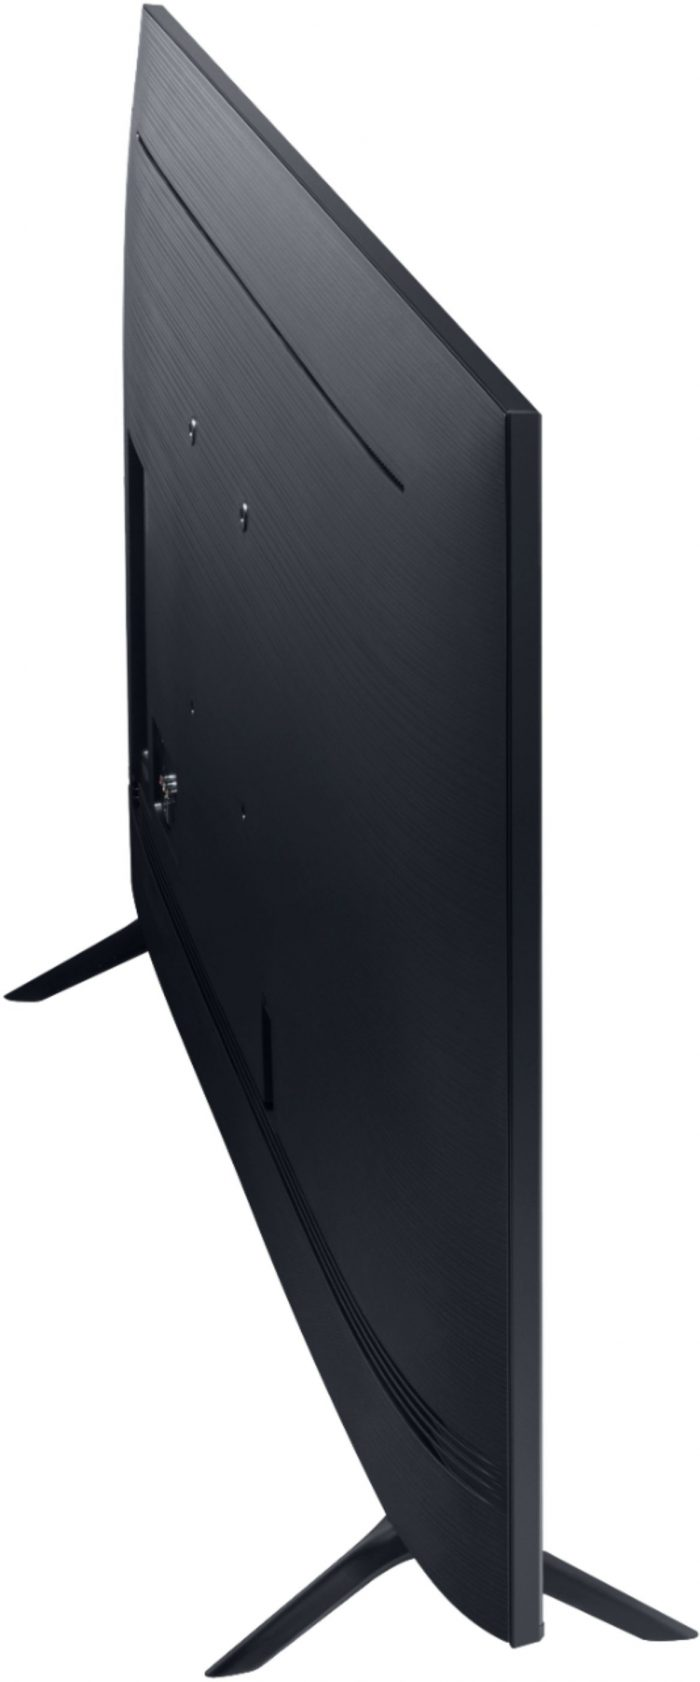 Samsung UN55TU800 back angle